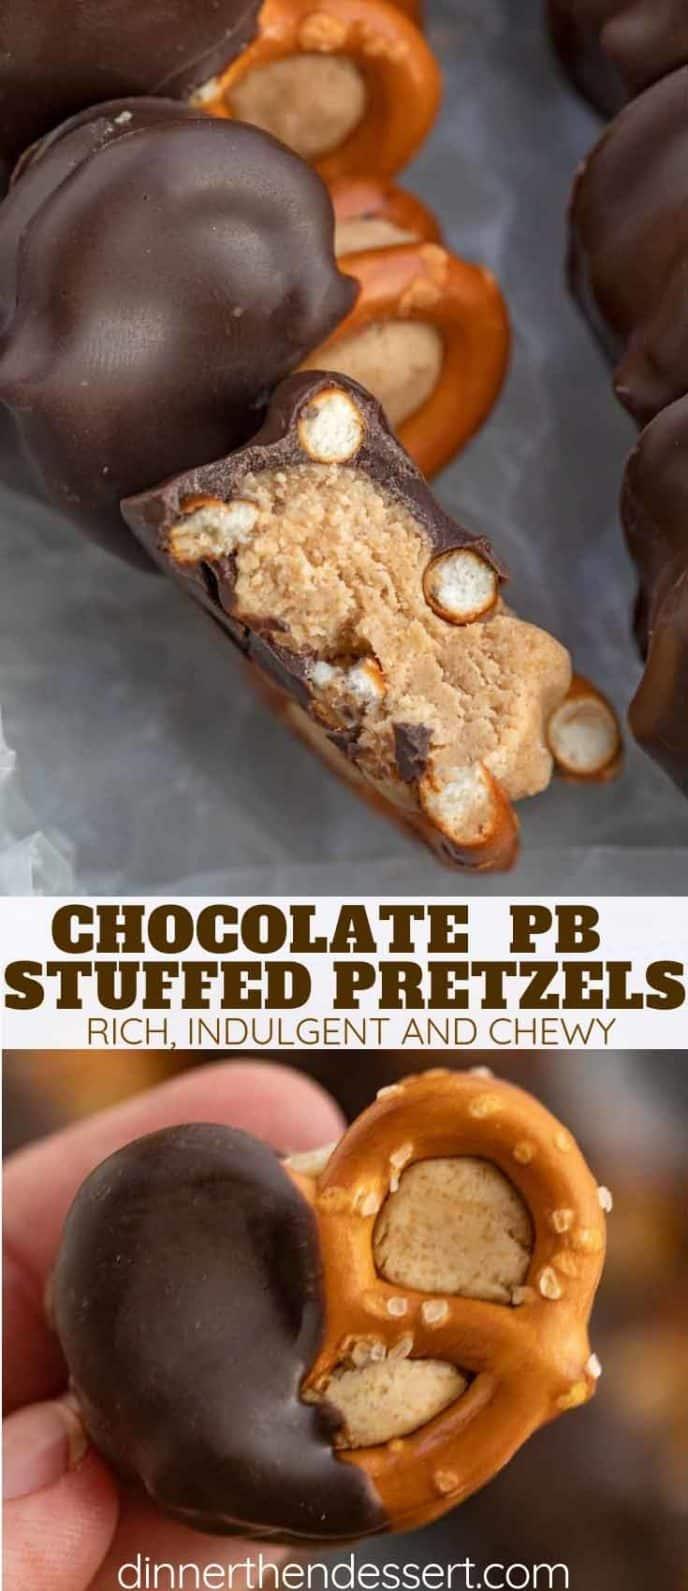 Chocolate PB Pretzel Bites